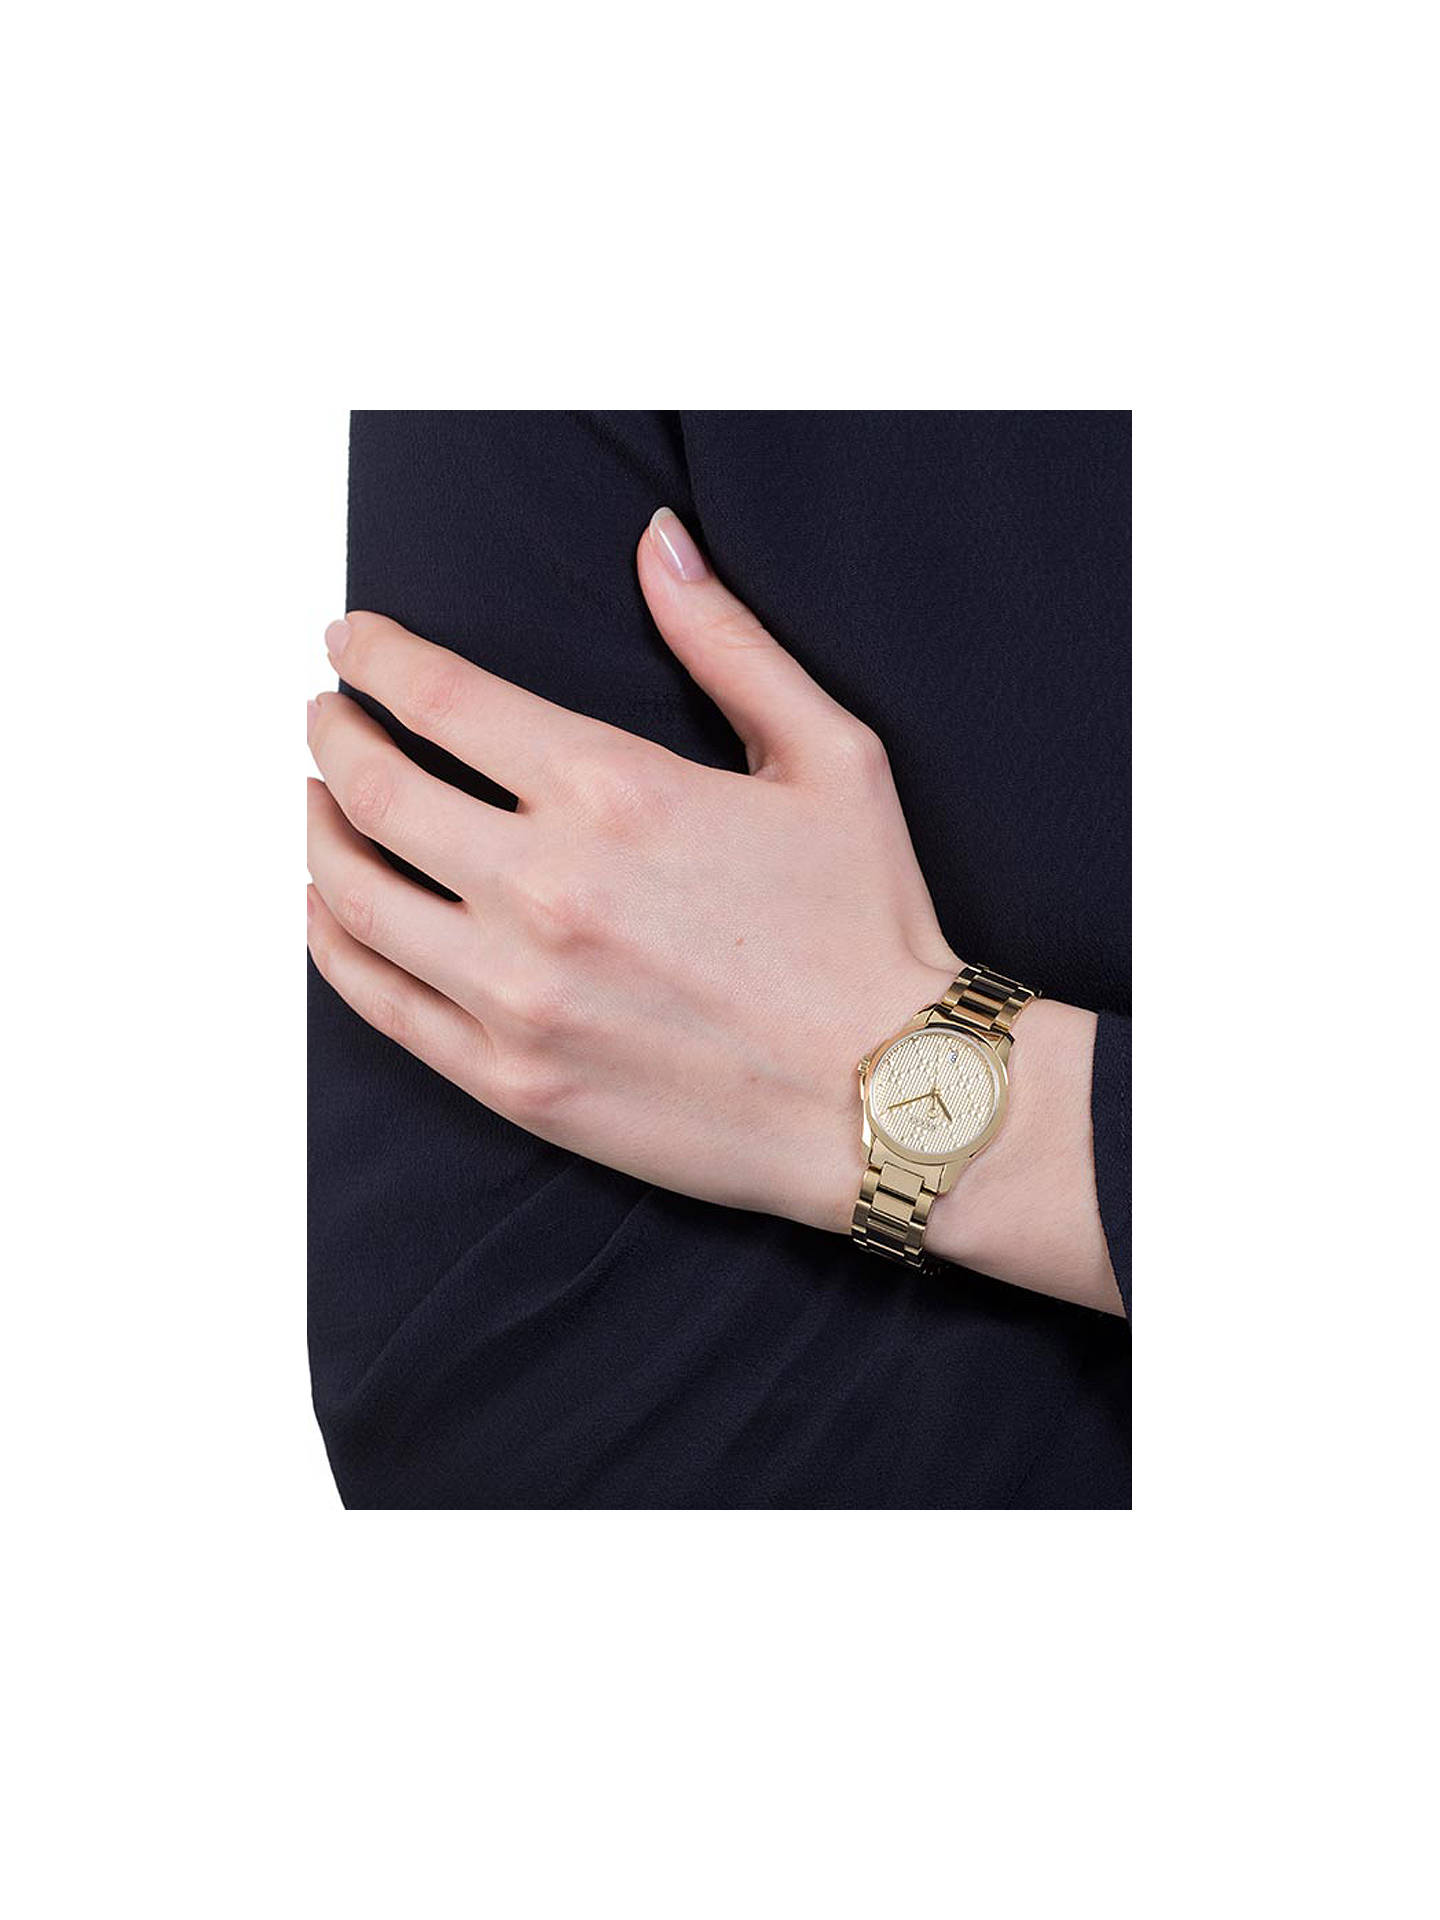 401abaf62c2 ... Buy Gucci YA126553 Women s G-Timeless Date Bracelet Strap Watch